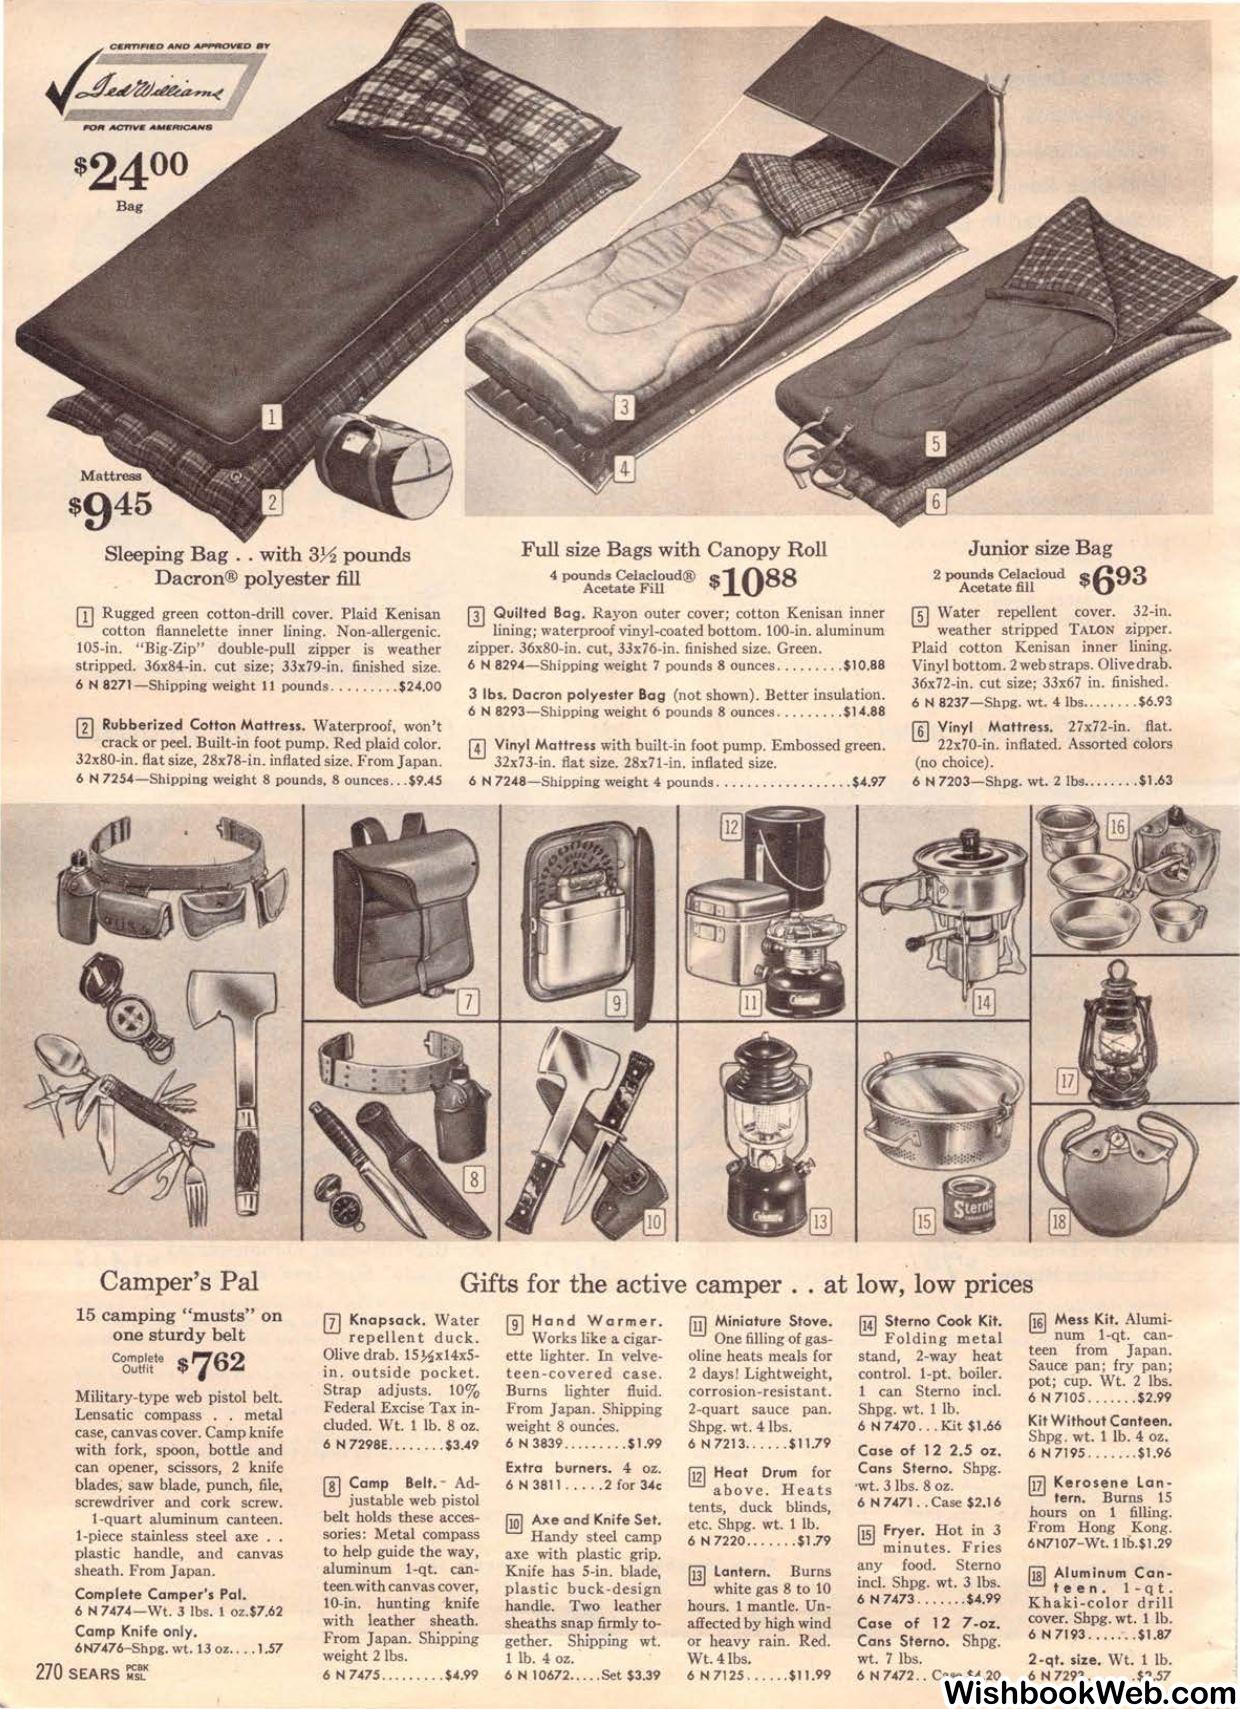 Aluminum 1 Quart Canteen With Cover /& Olive Drab Pistol Belt Kit